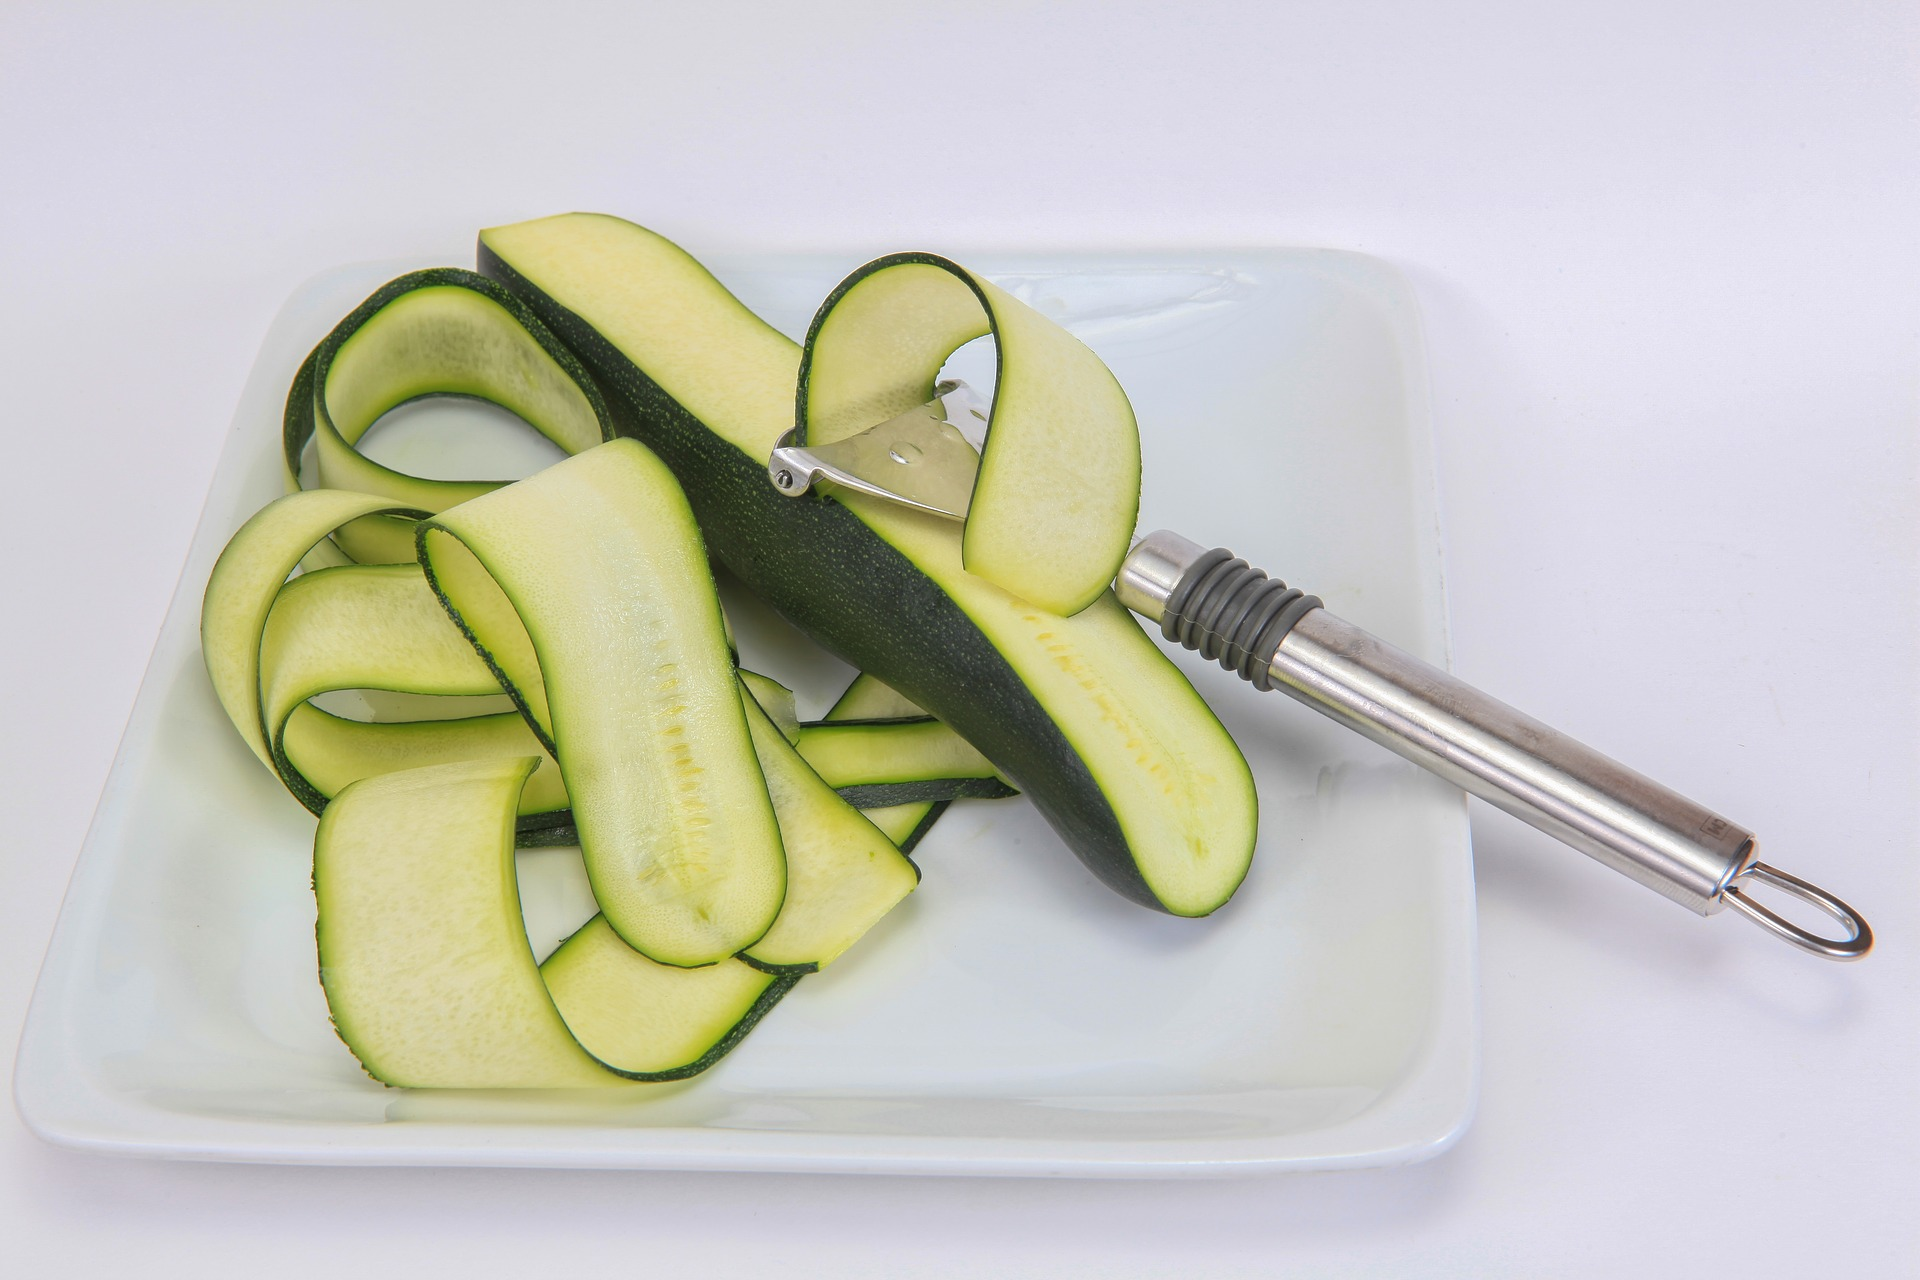 Spiedini di zucchine farcite